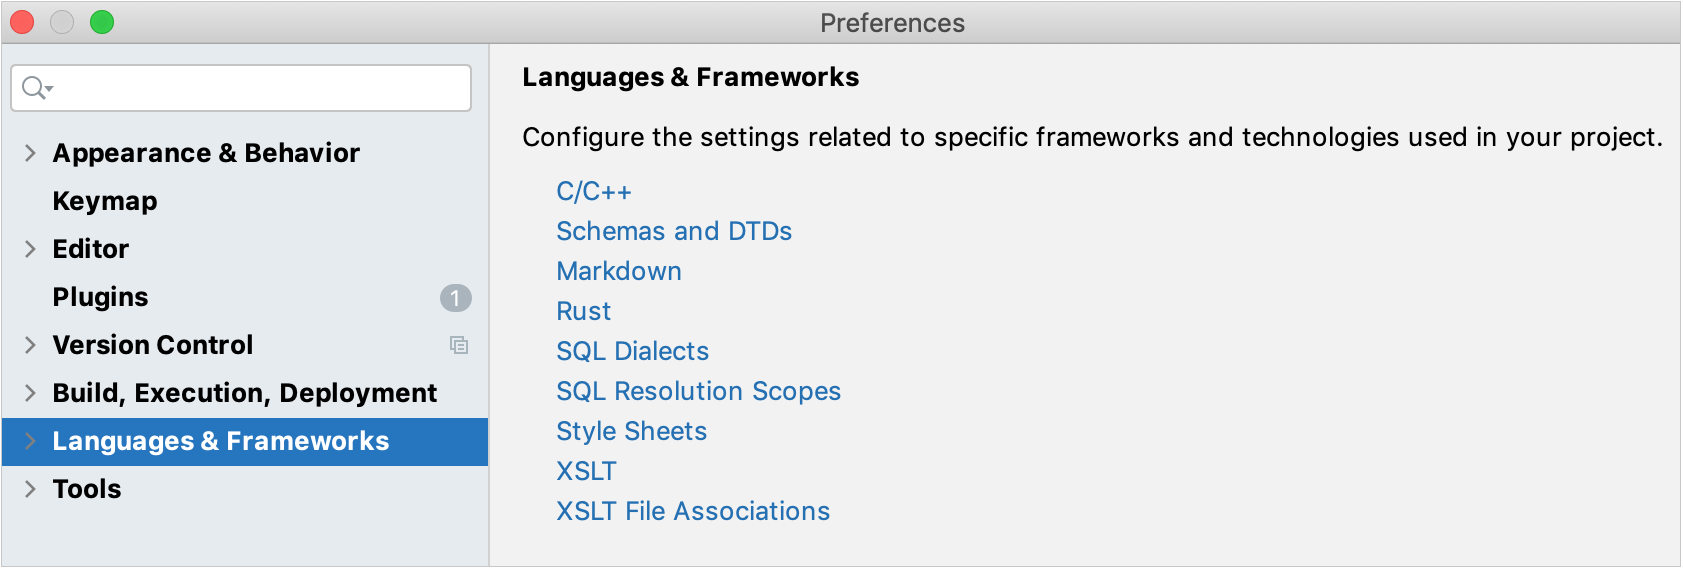 Languages and Frameworks